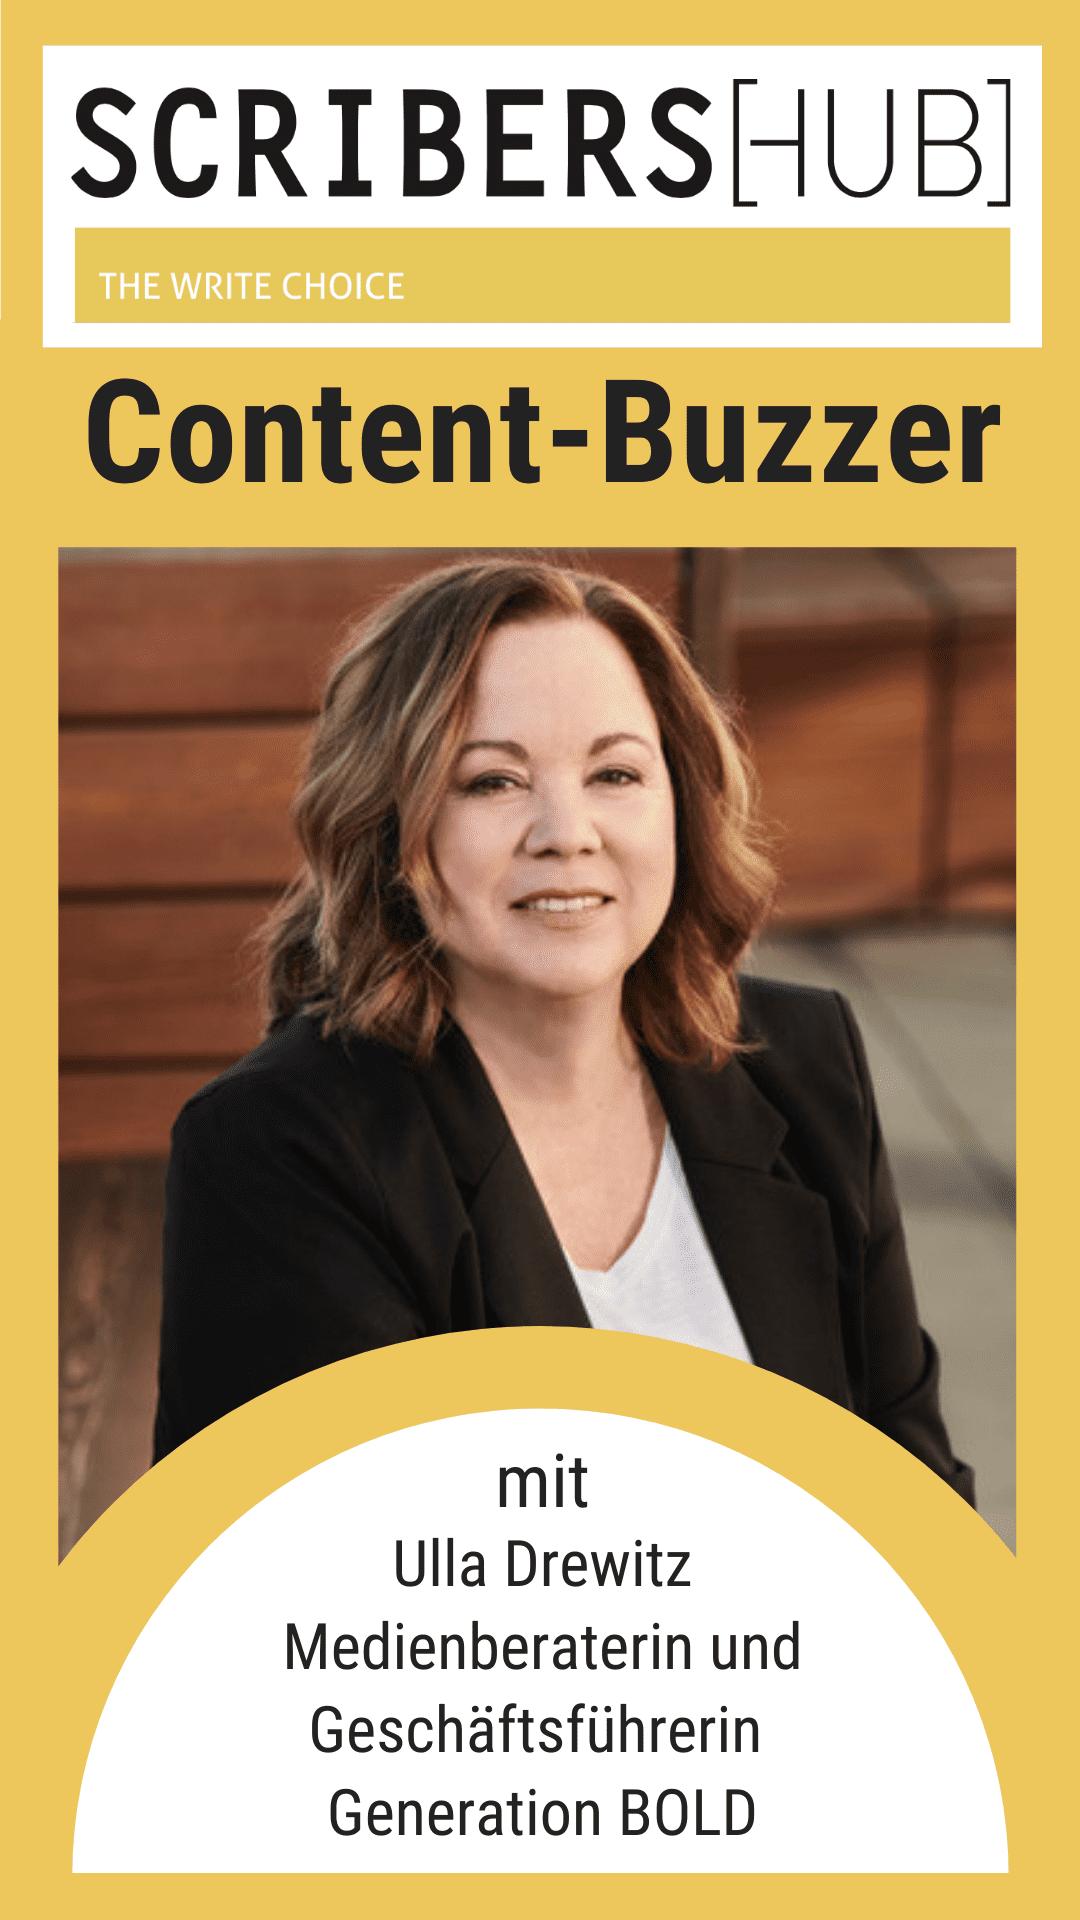 Guter Content verlangt Einsatz